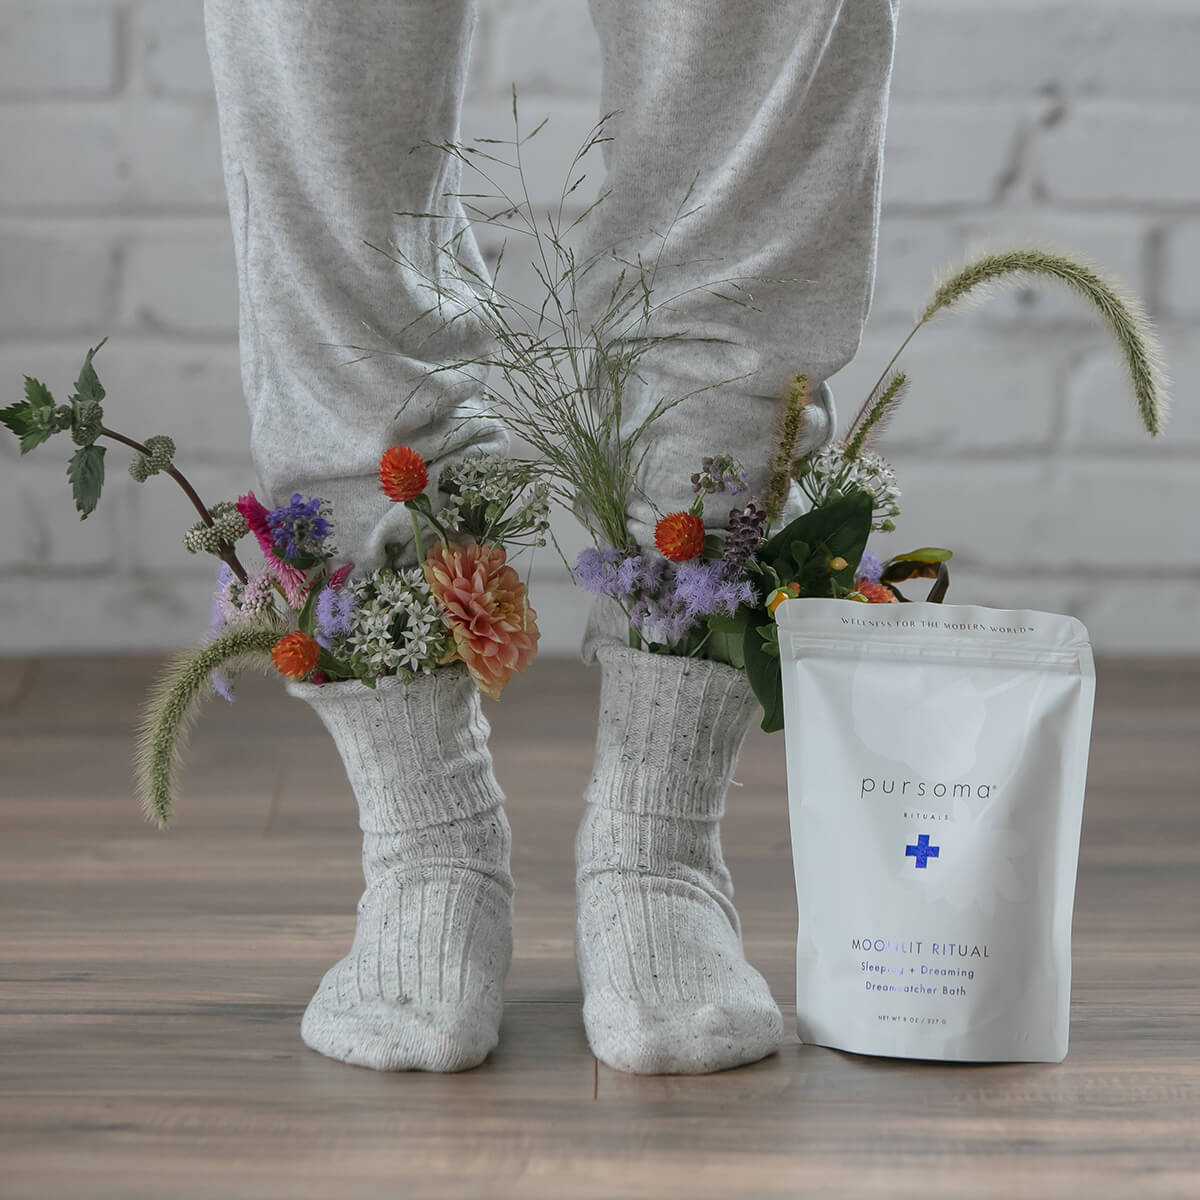 Pursoma Moonlit Ritual Bath Soak - bag on floor with flowers